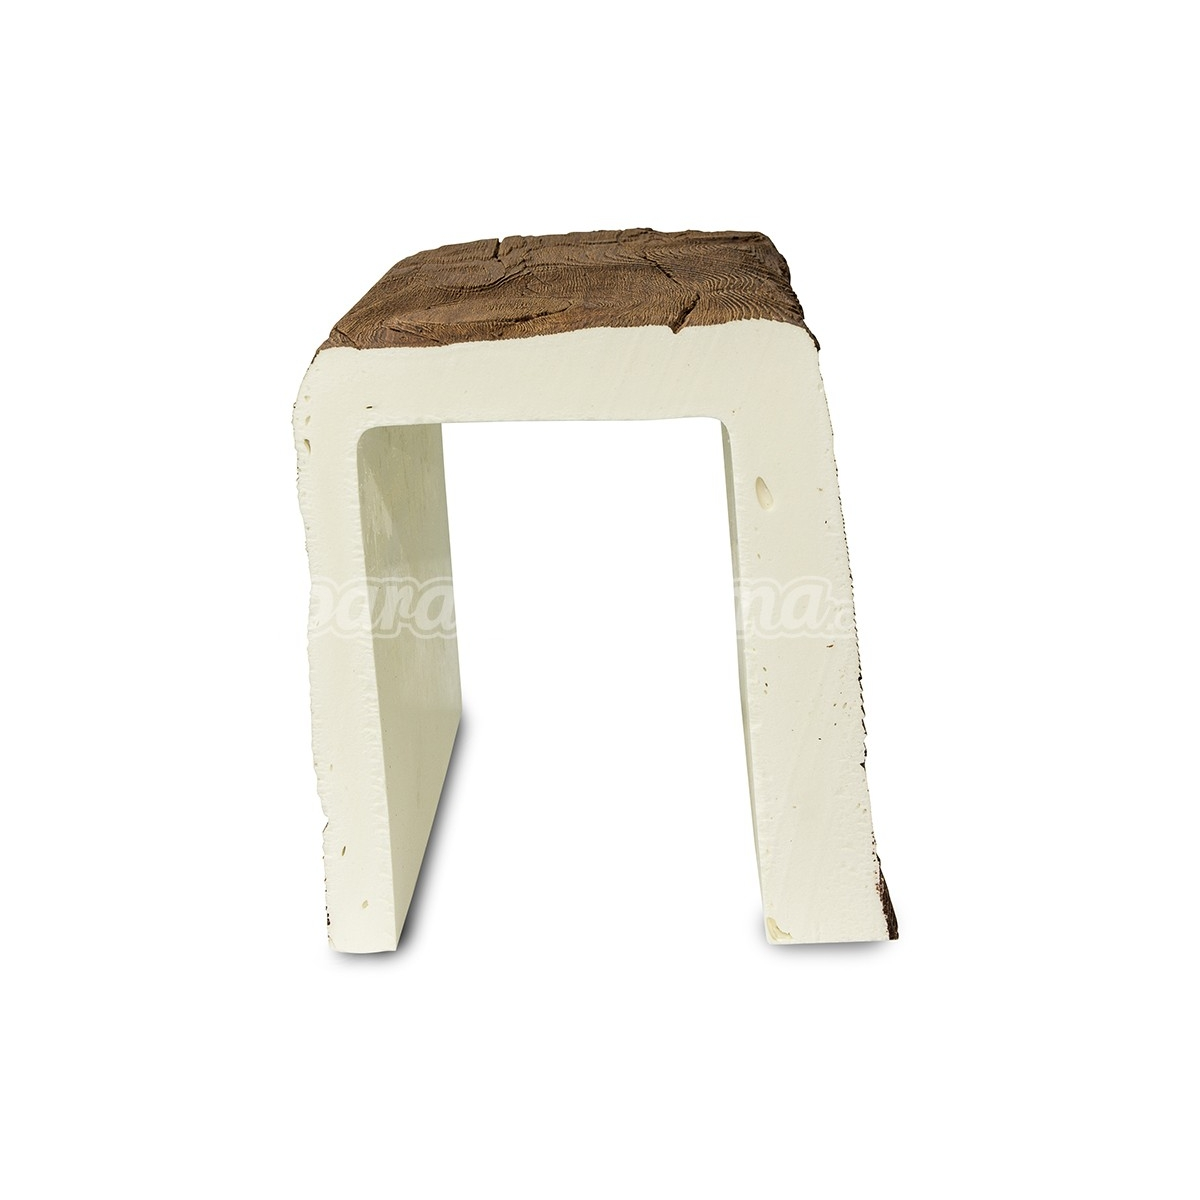 Viga imitación a madera 300x23x18 Grupo Unamacor